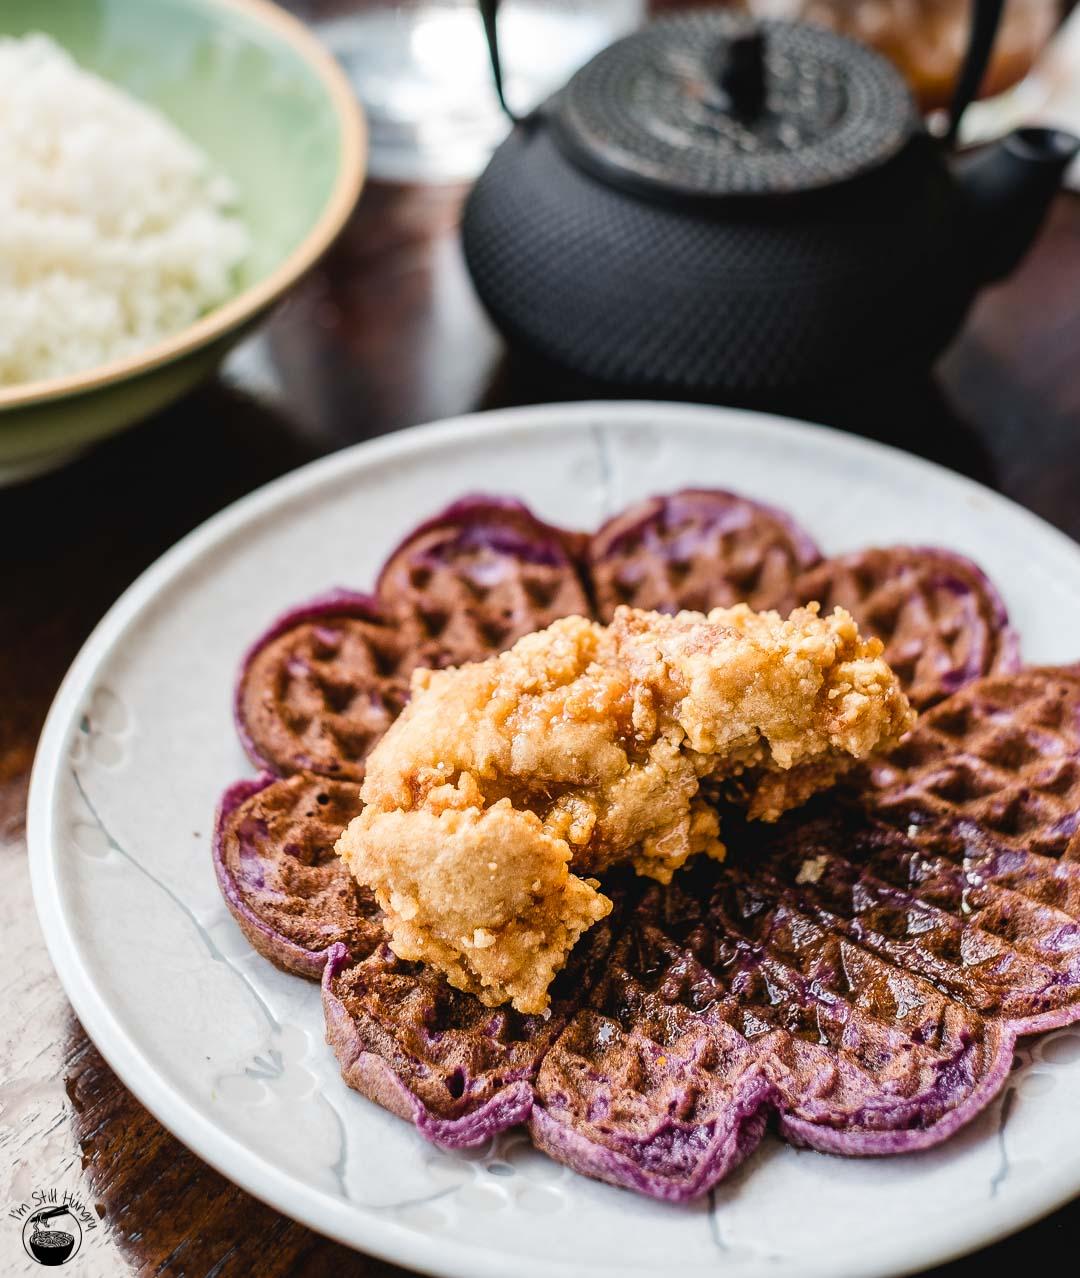 ACME Sam's fried chicken, ube waffle, maple syrup